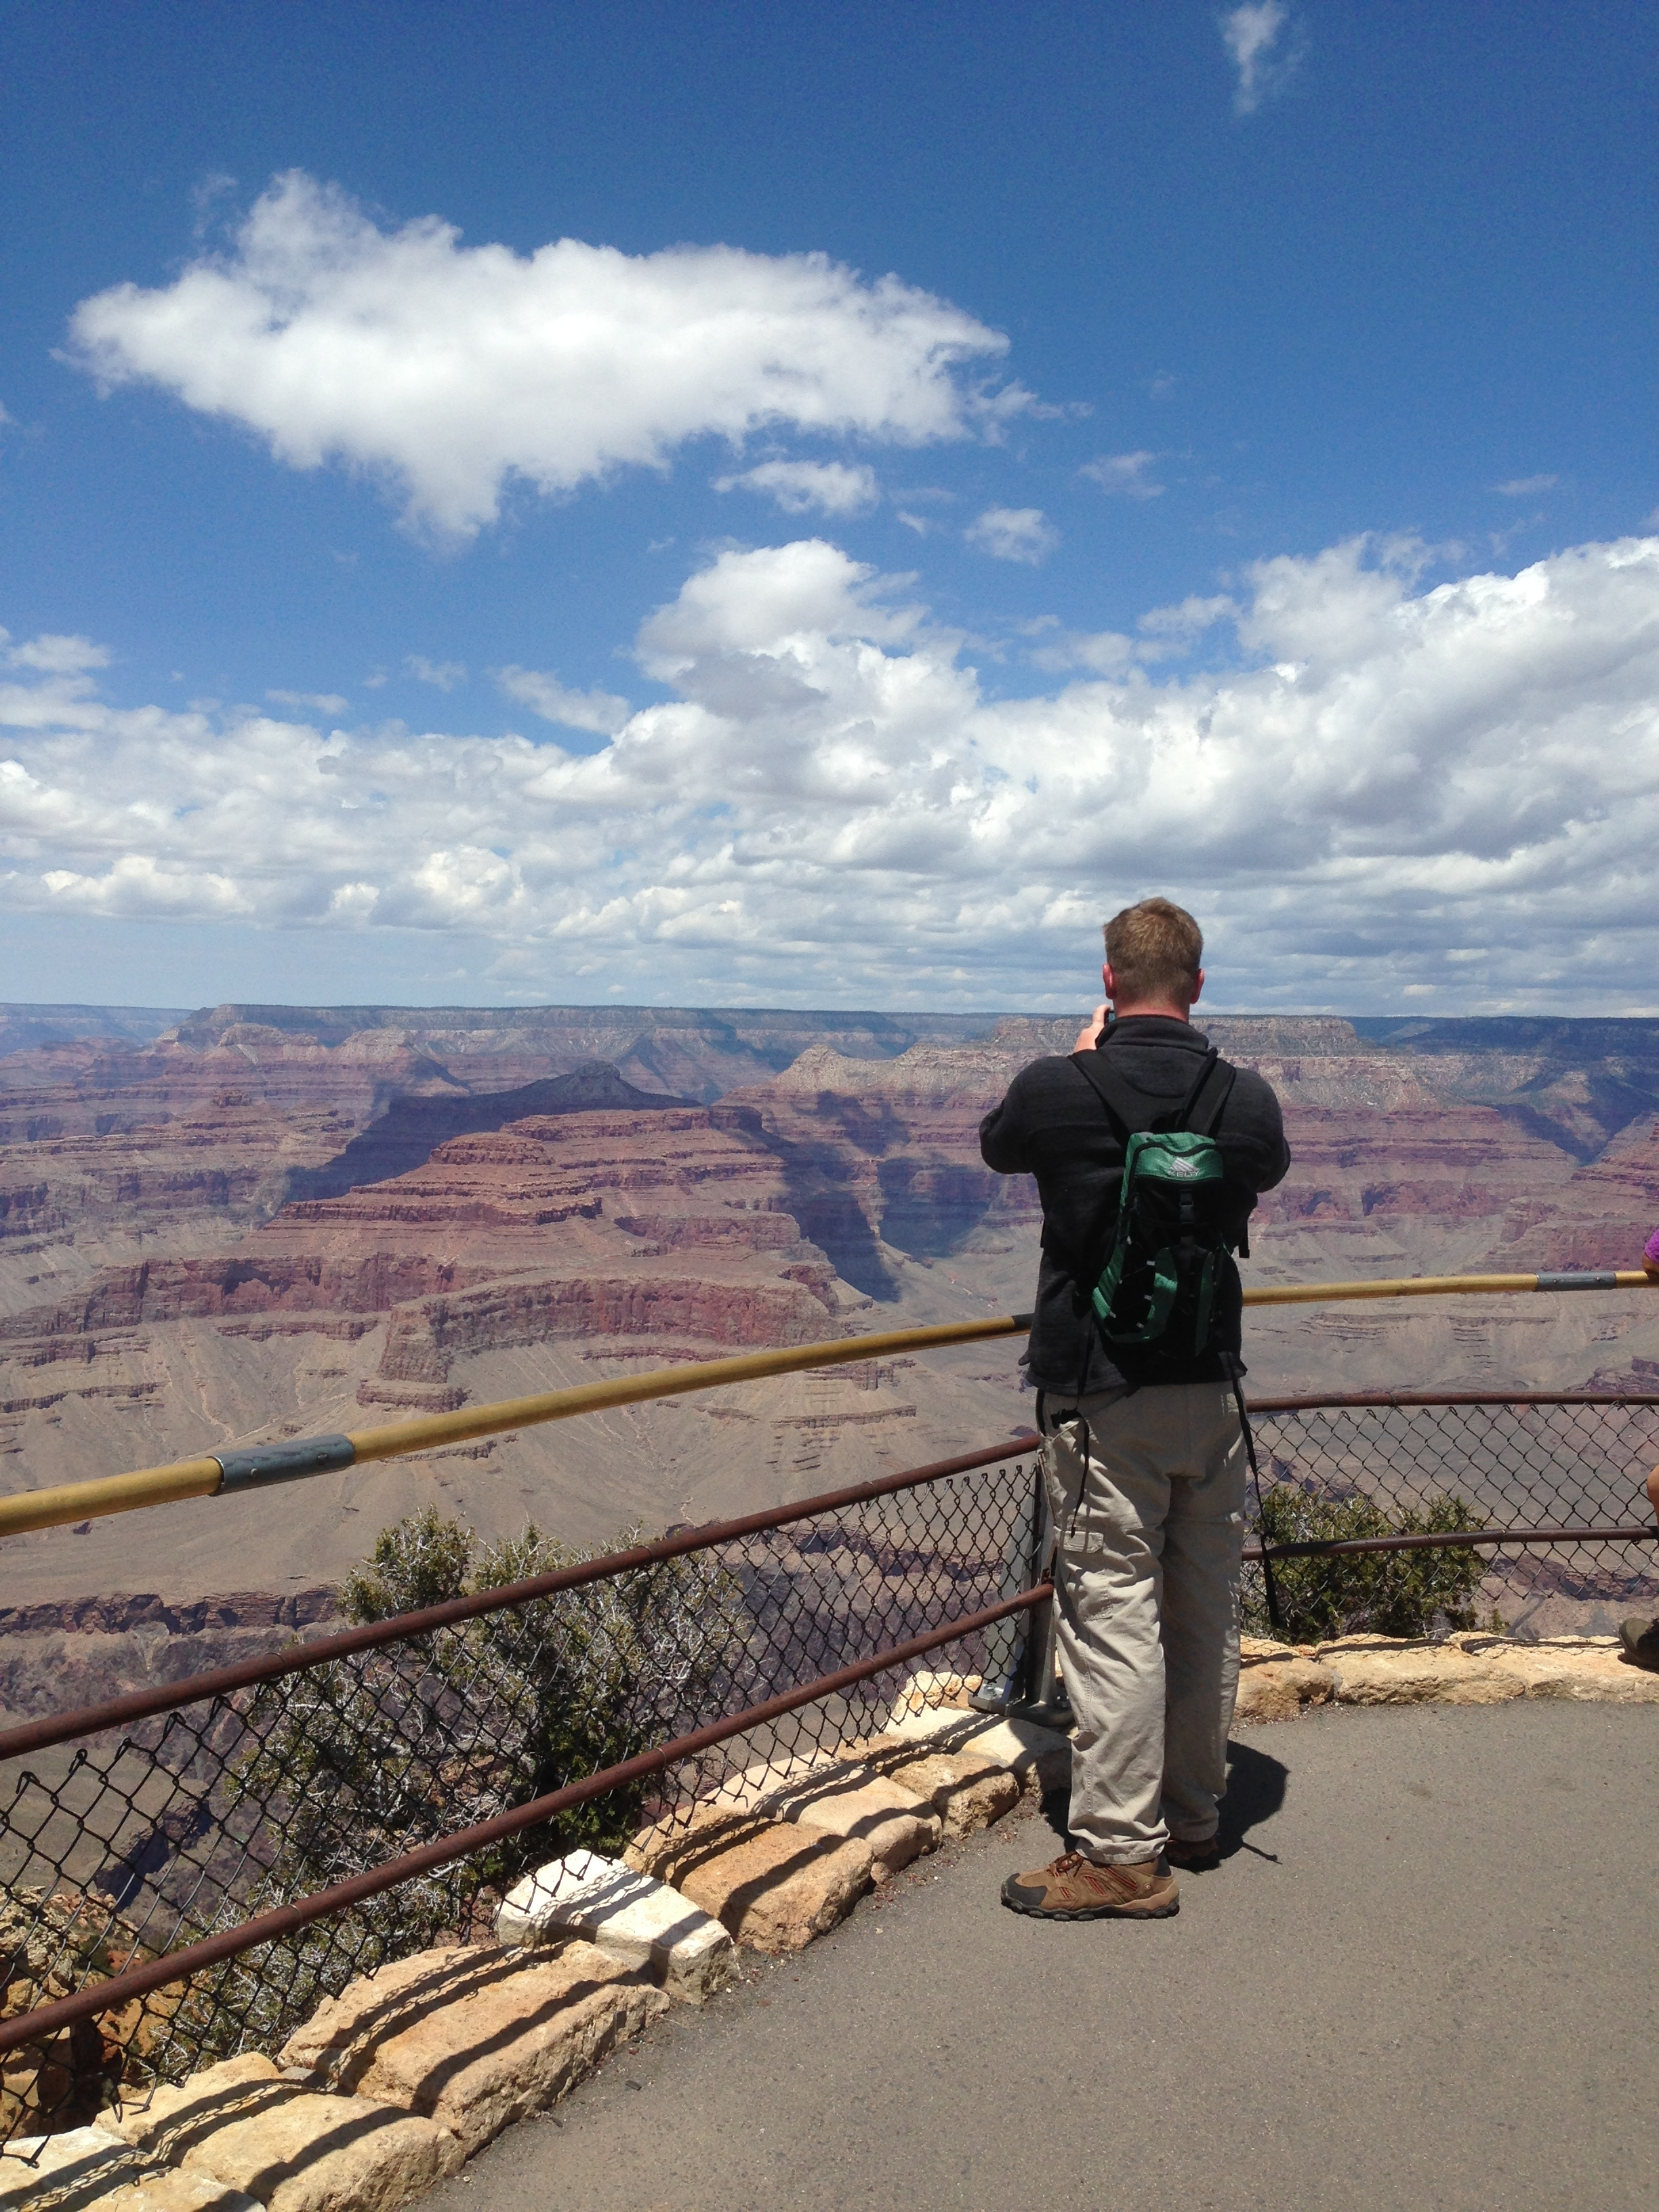 Iain approaching a guarded precipice.